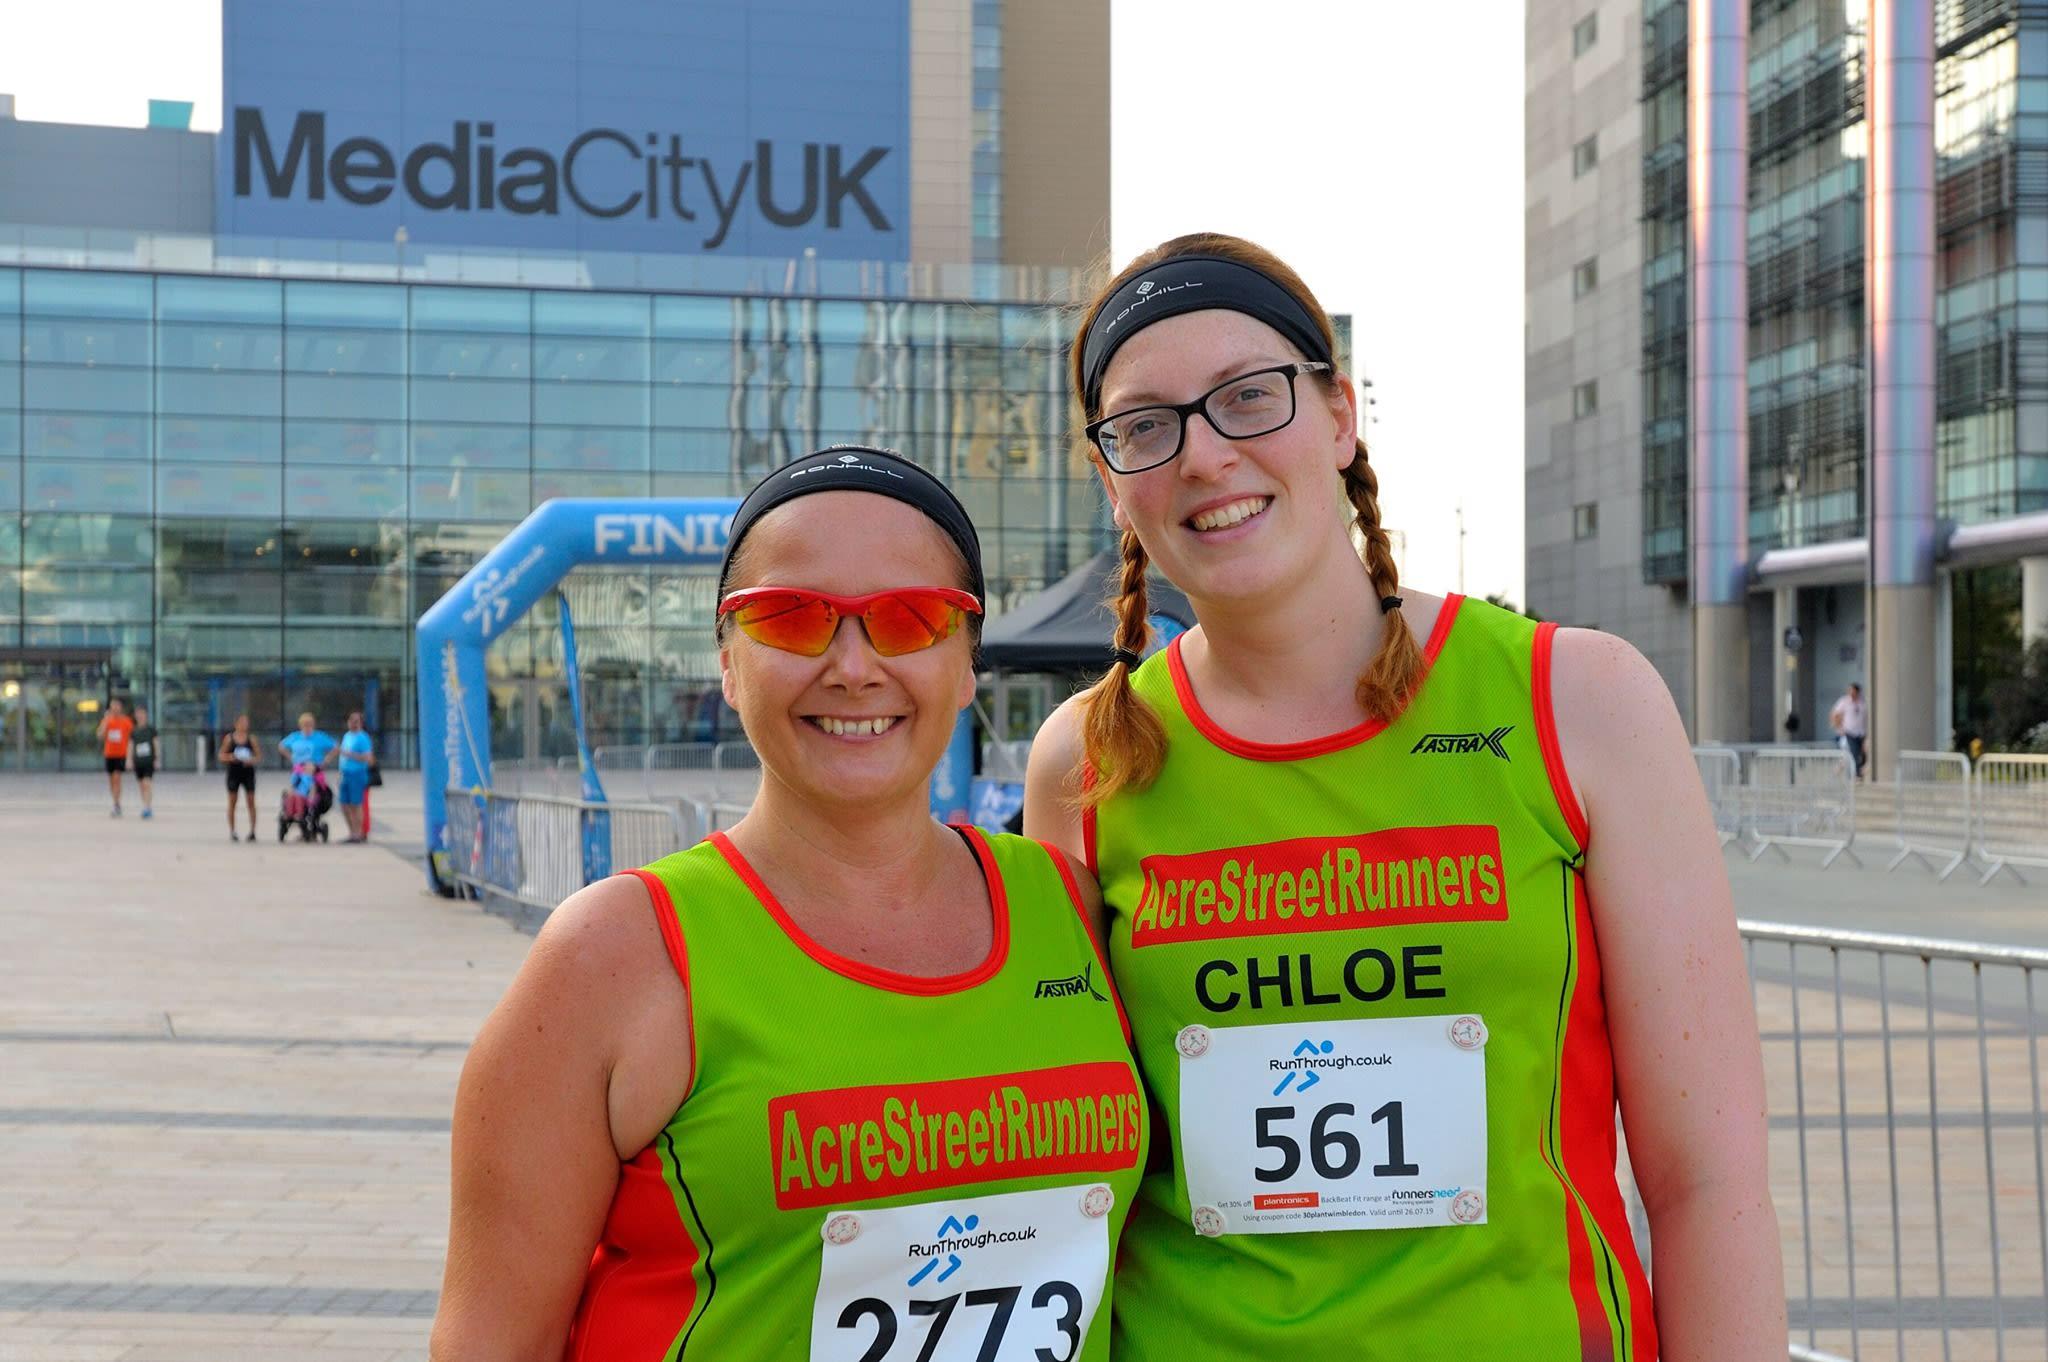 Run Media City 5k and 10k - August